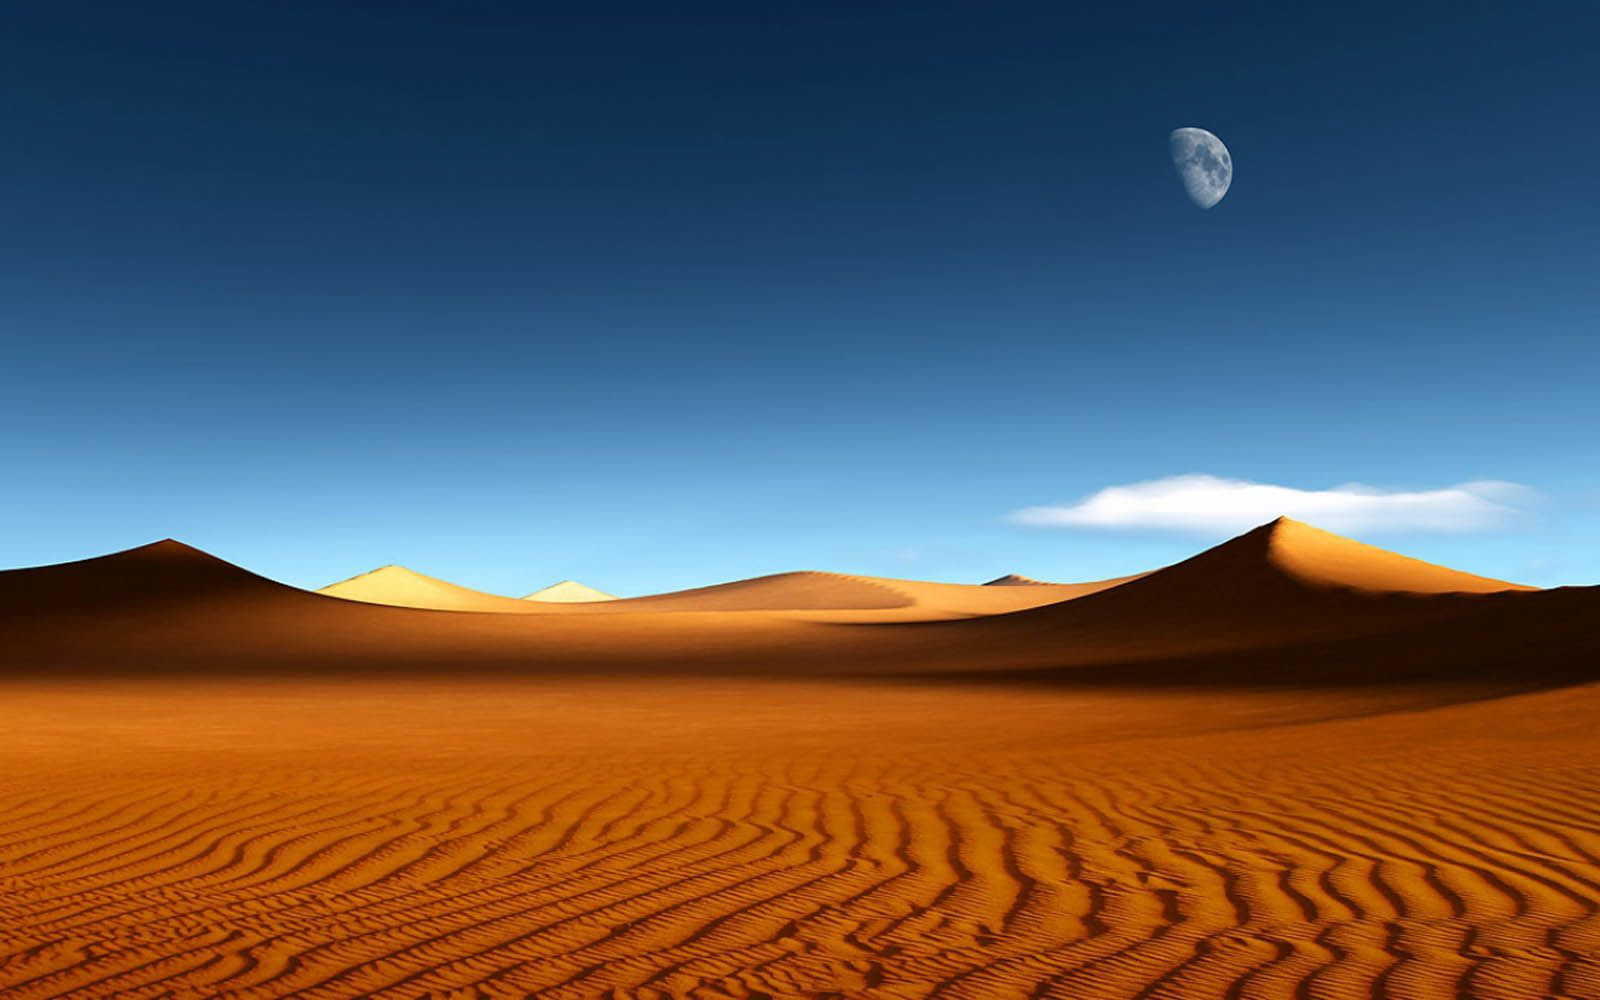 Hi Def Wallpaper Desert Free Download Pictures Desert Travel Scenery Wallpaper